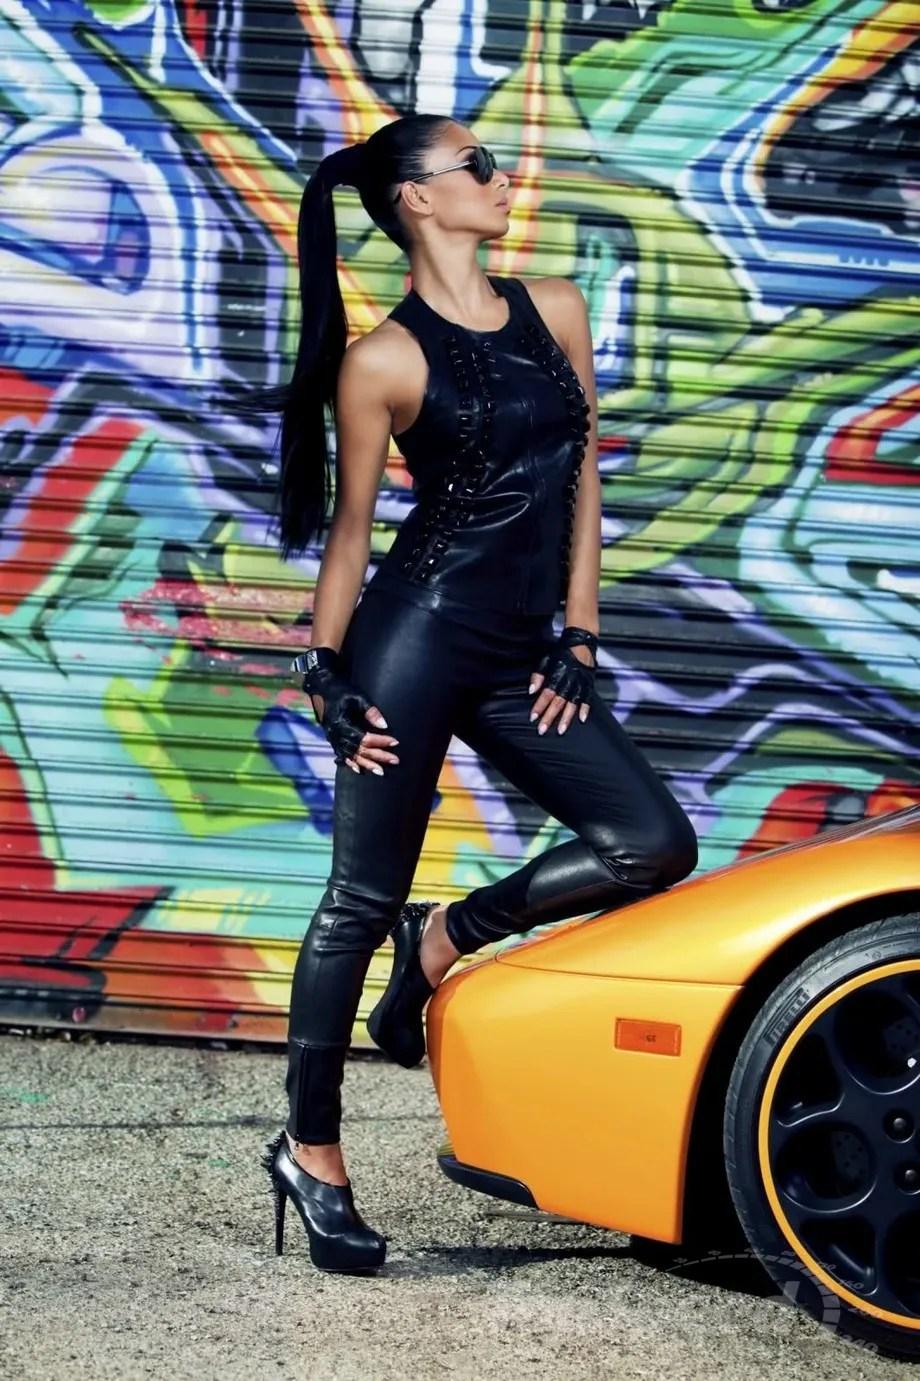 Exotic Car Photos Wallpaper Babes On Wheels Nicole Scherzinger Tames A Lamborghini